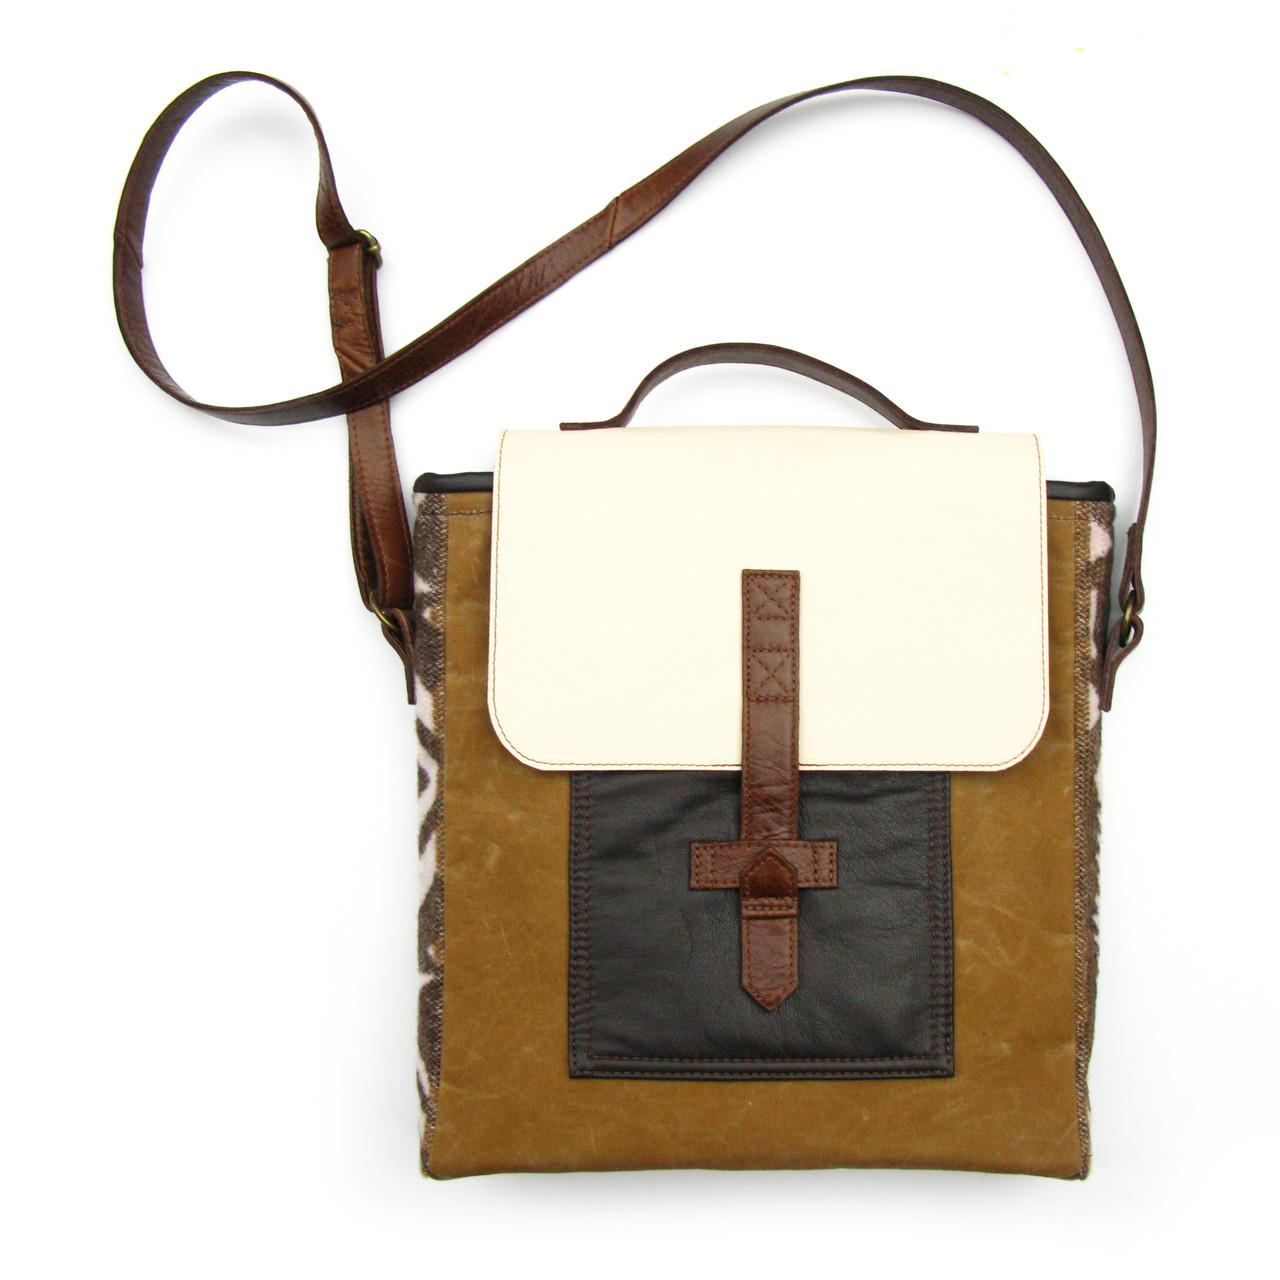 Jensen leather handbag